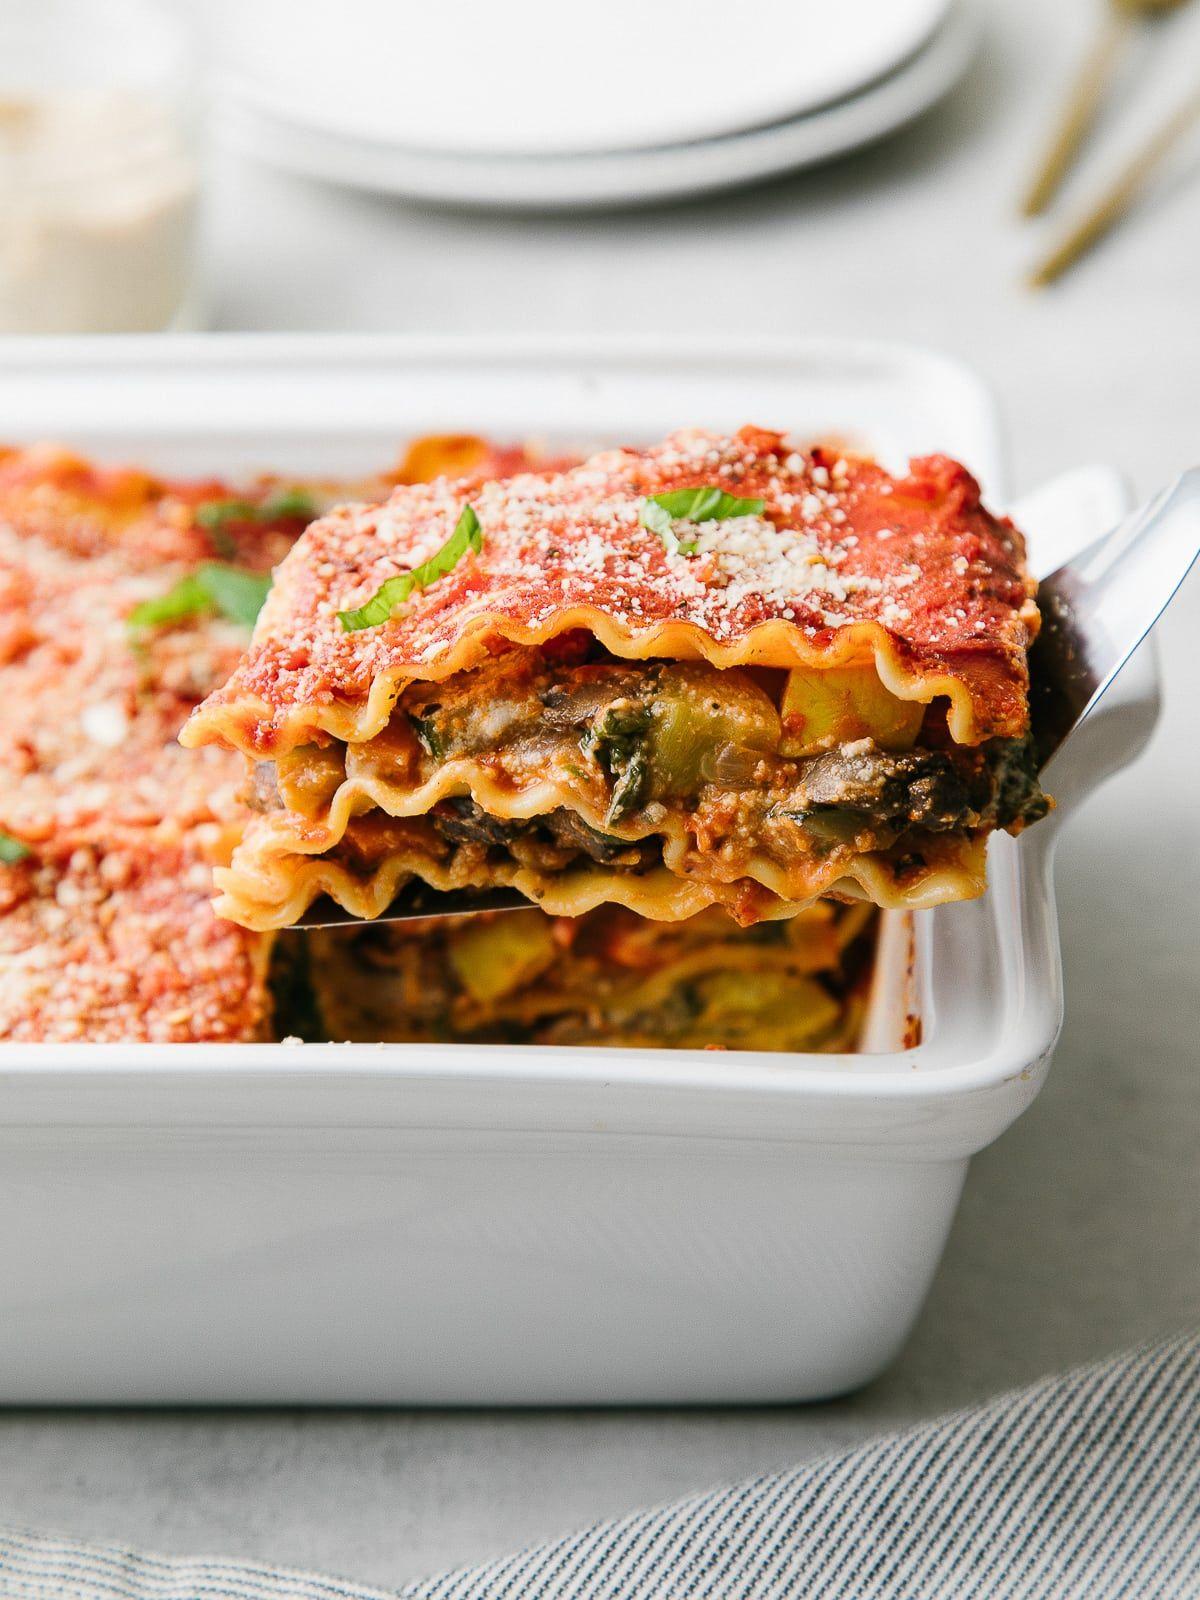 Best Vegan Lasagna Ws The Simple Veganista Vegetable Lasagna Recipes Vegan Lasagna Vegan Recipes Easy